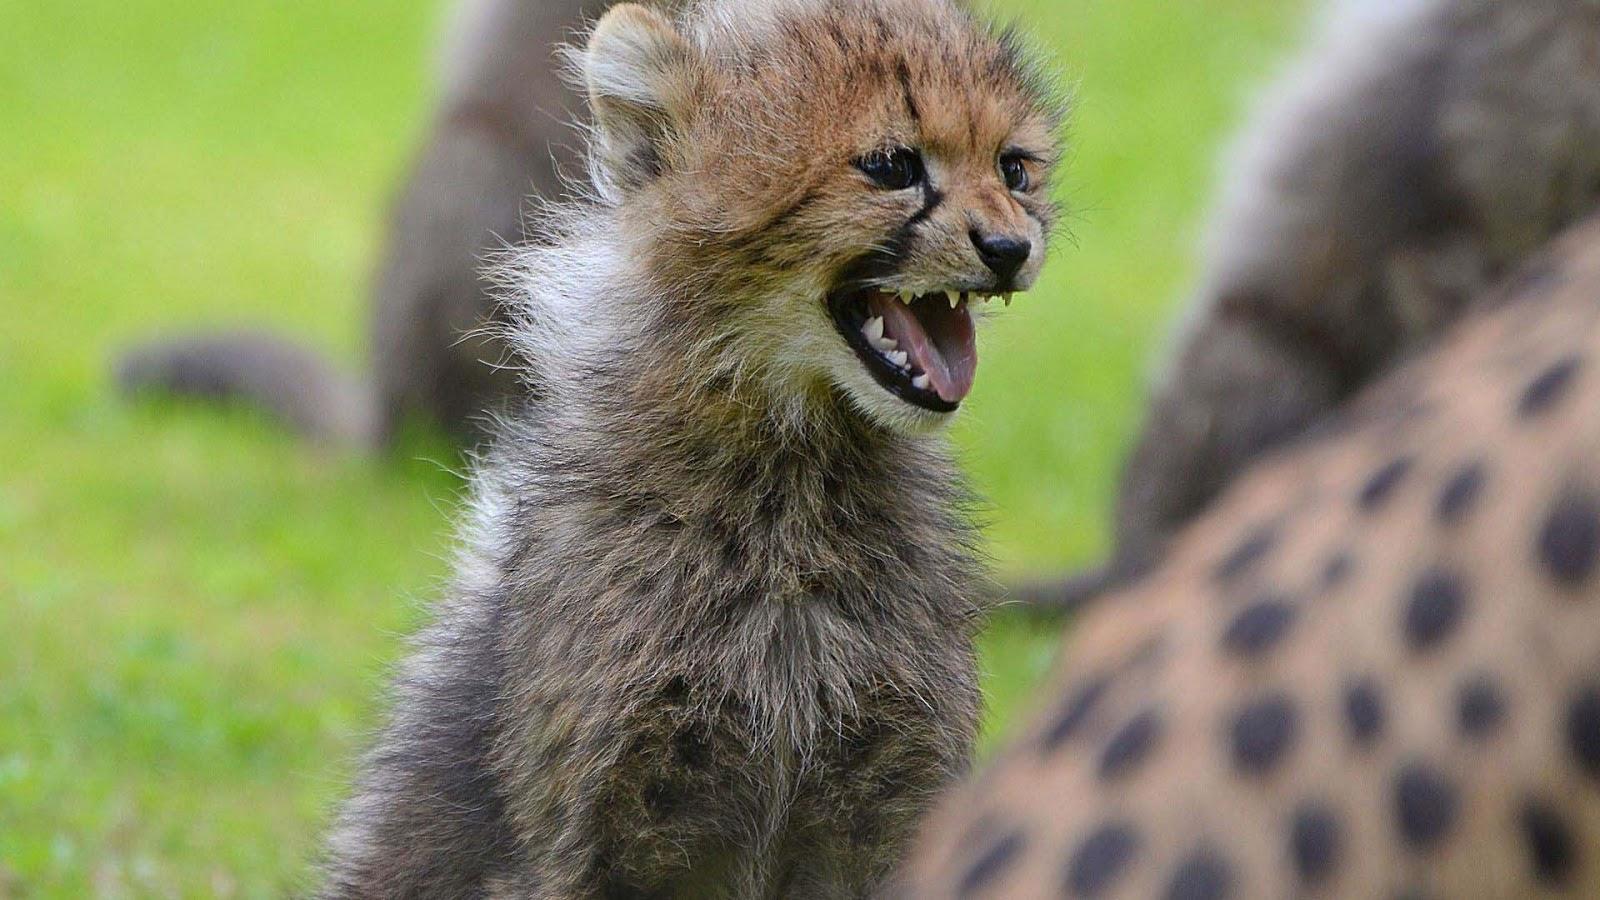 angry baby cheetah - photo #33